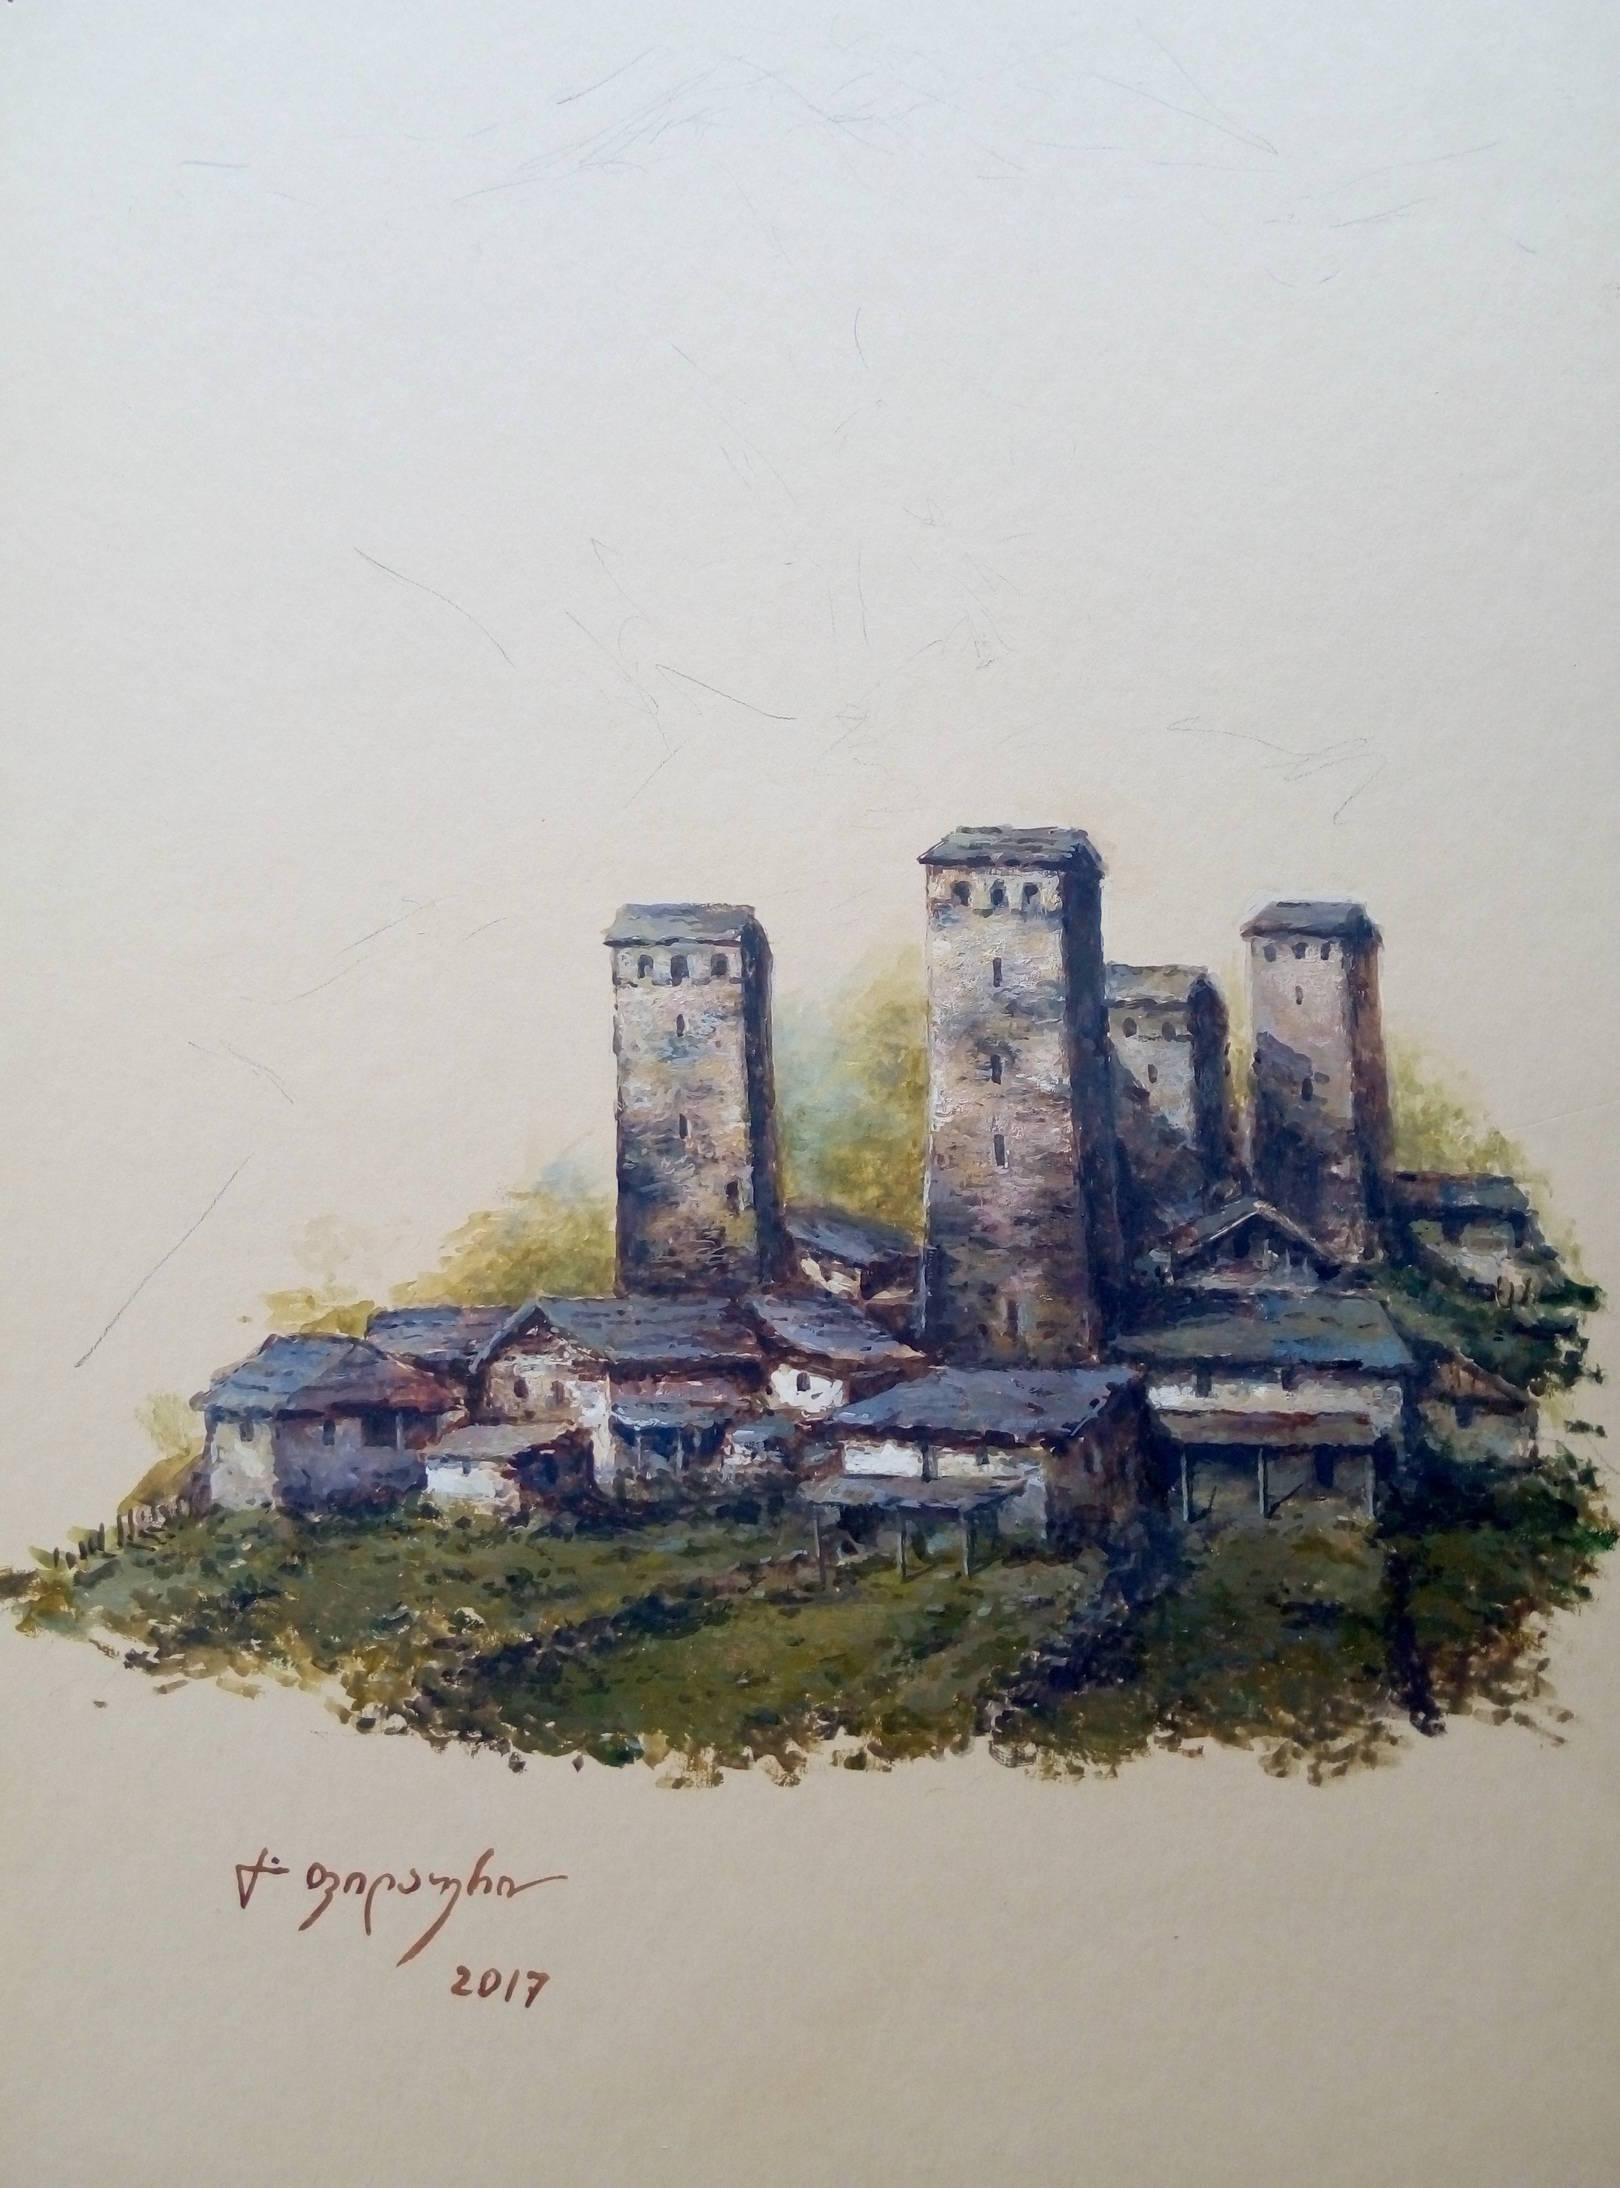 «Сванети»       бумага, акварель, гуашь «Svaneti»         paper, aquarelle, gouache 36x26, 2017